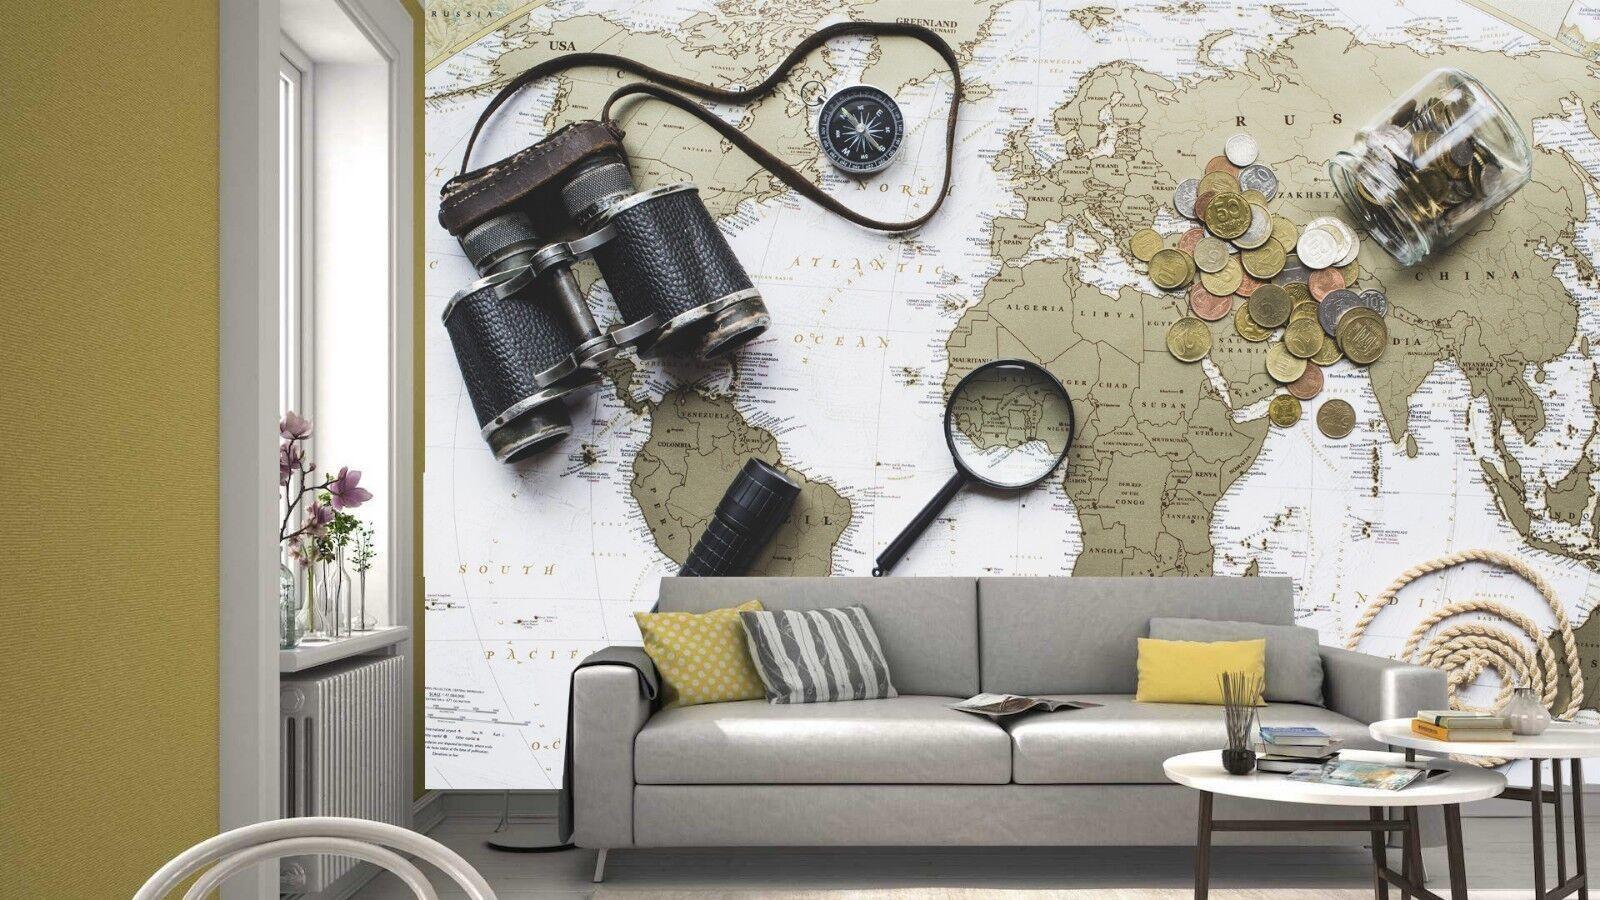 Travel Tour Vintage World Map Wallpaper Mural Photo Kids Room